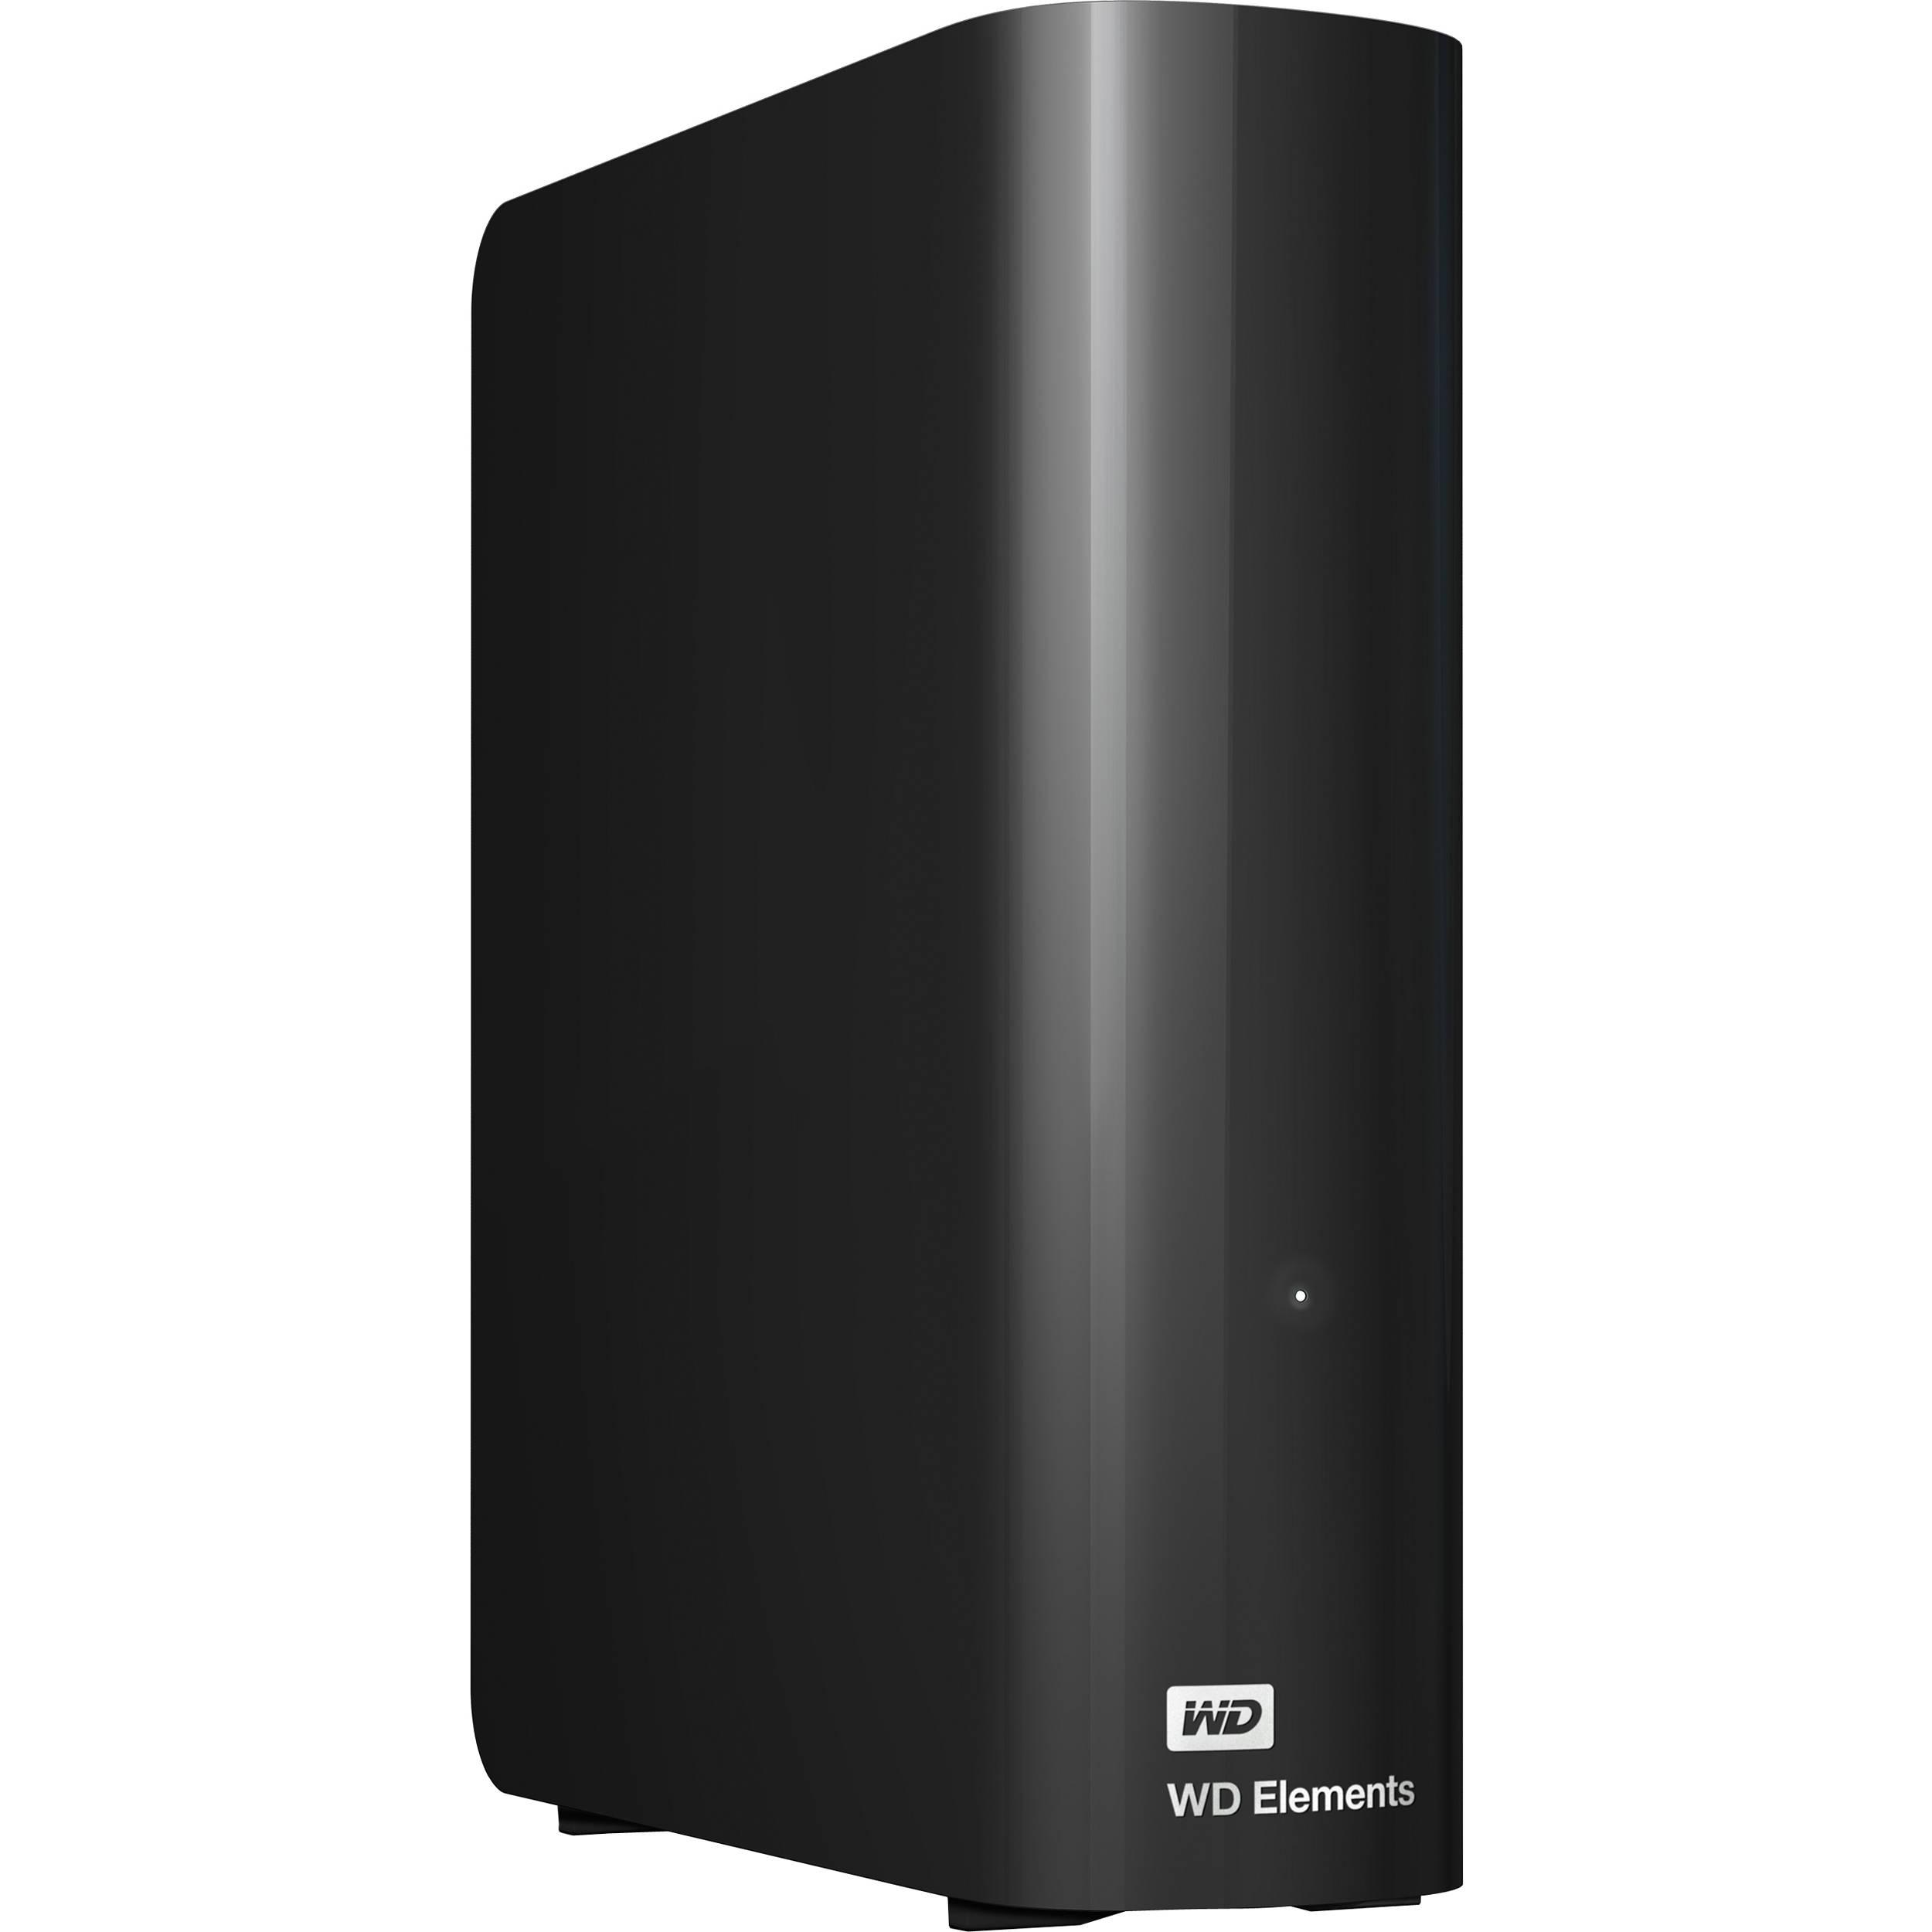 External Hard Drives and SSDs